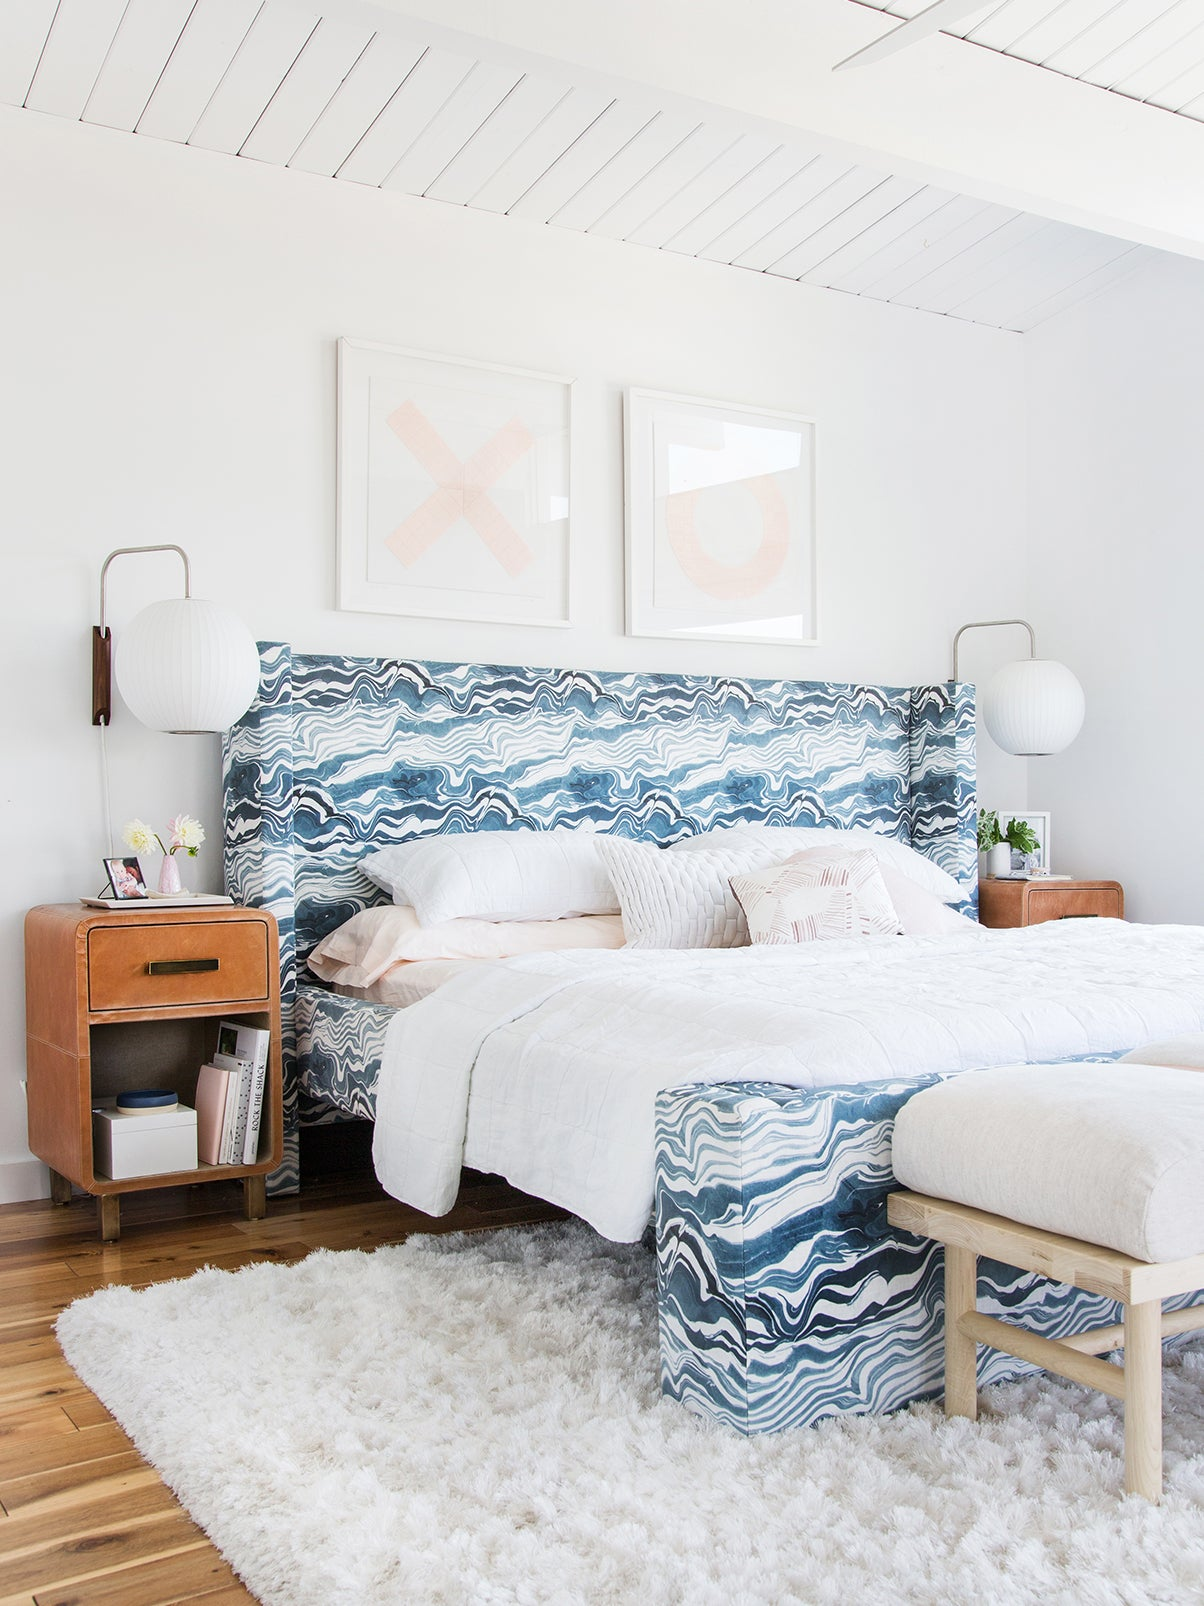 amazon-comforter-domino